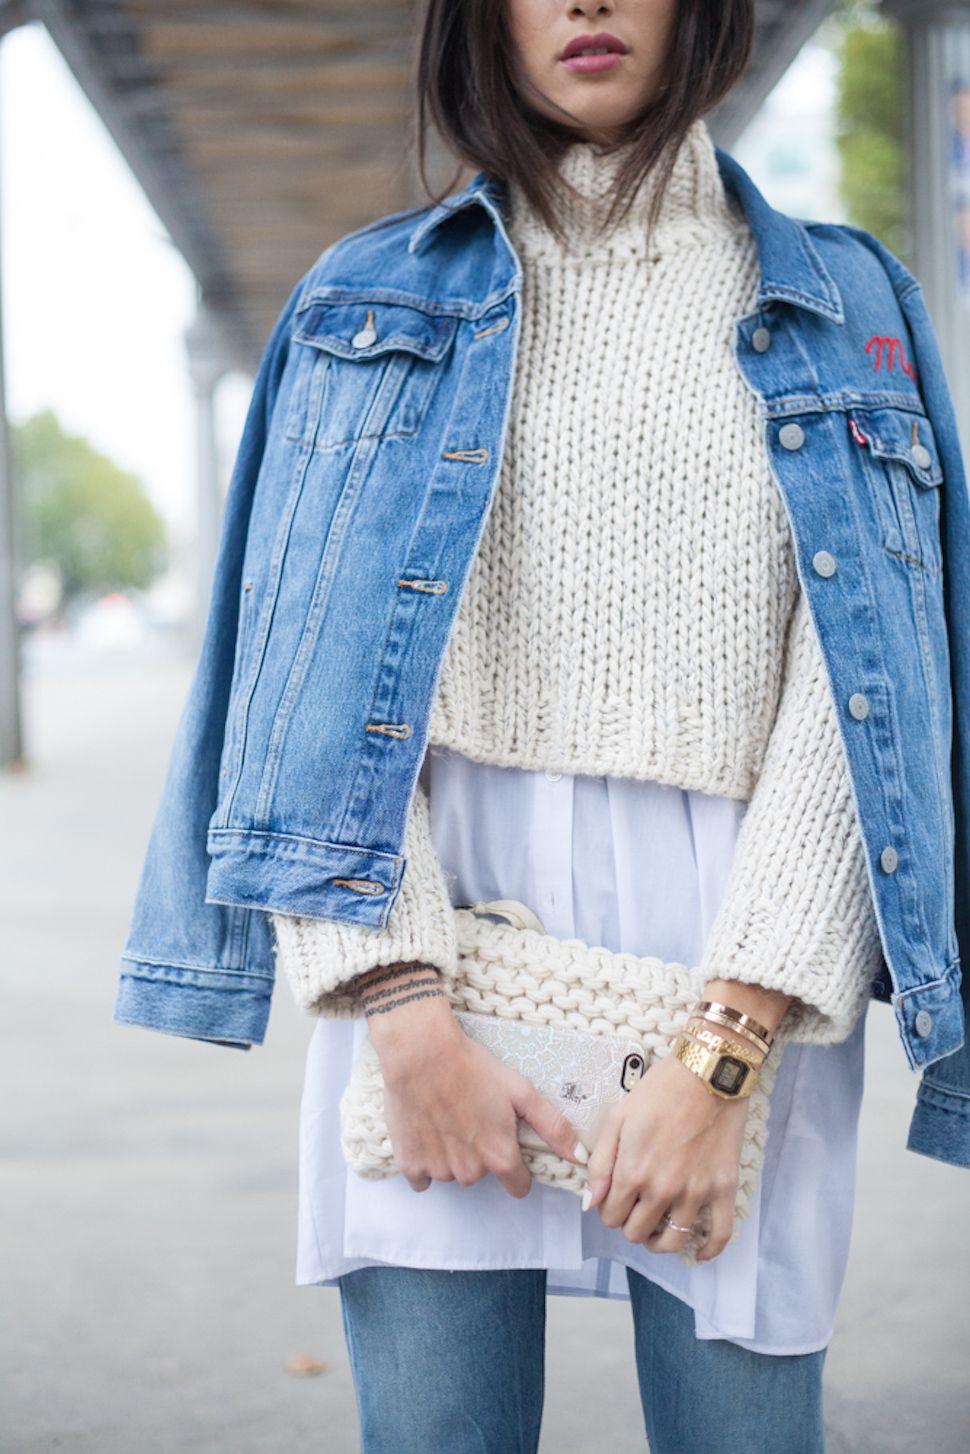 En Femme Veste Jean JeansFashion Inspiration All BCsQxtdhr